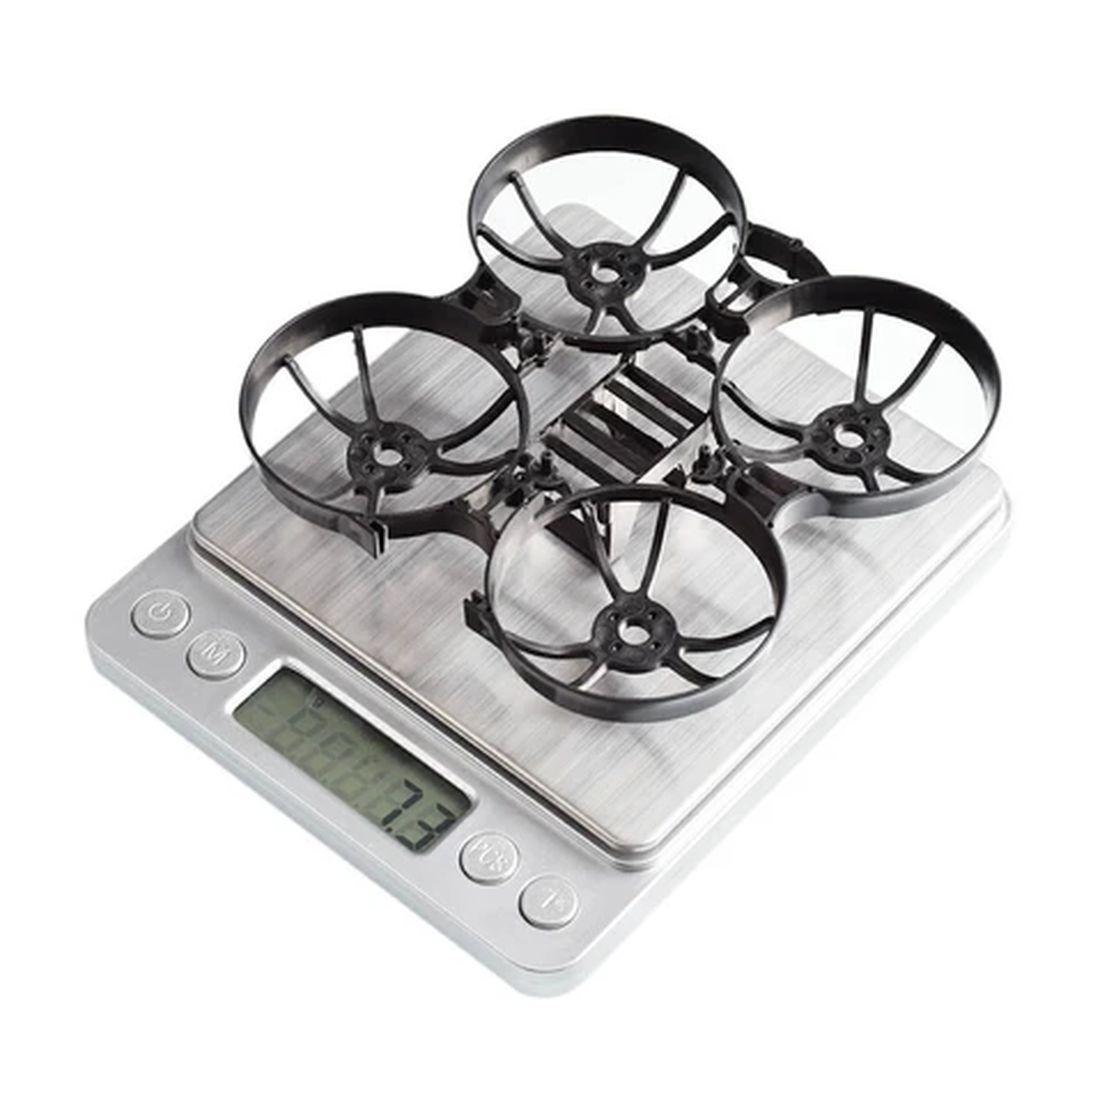 BETAFPV Beta75X Frame for 75X 2S 75X 3S 75X HD 11XX Motor for 75mm Racing Drone